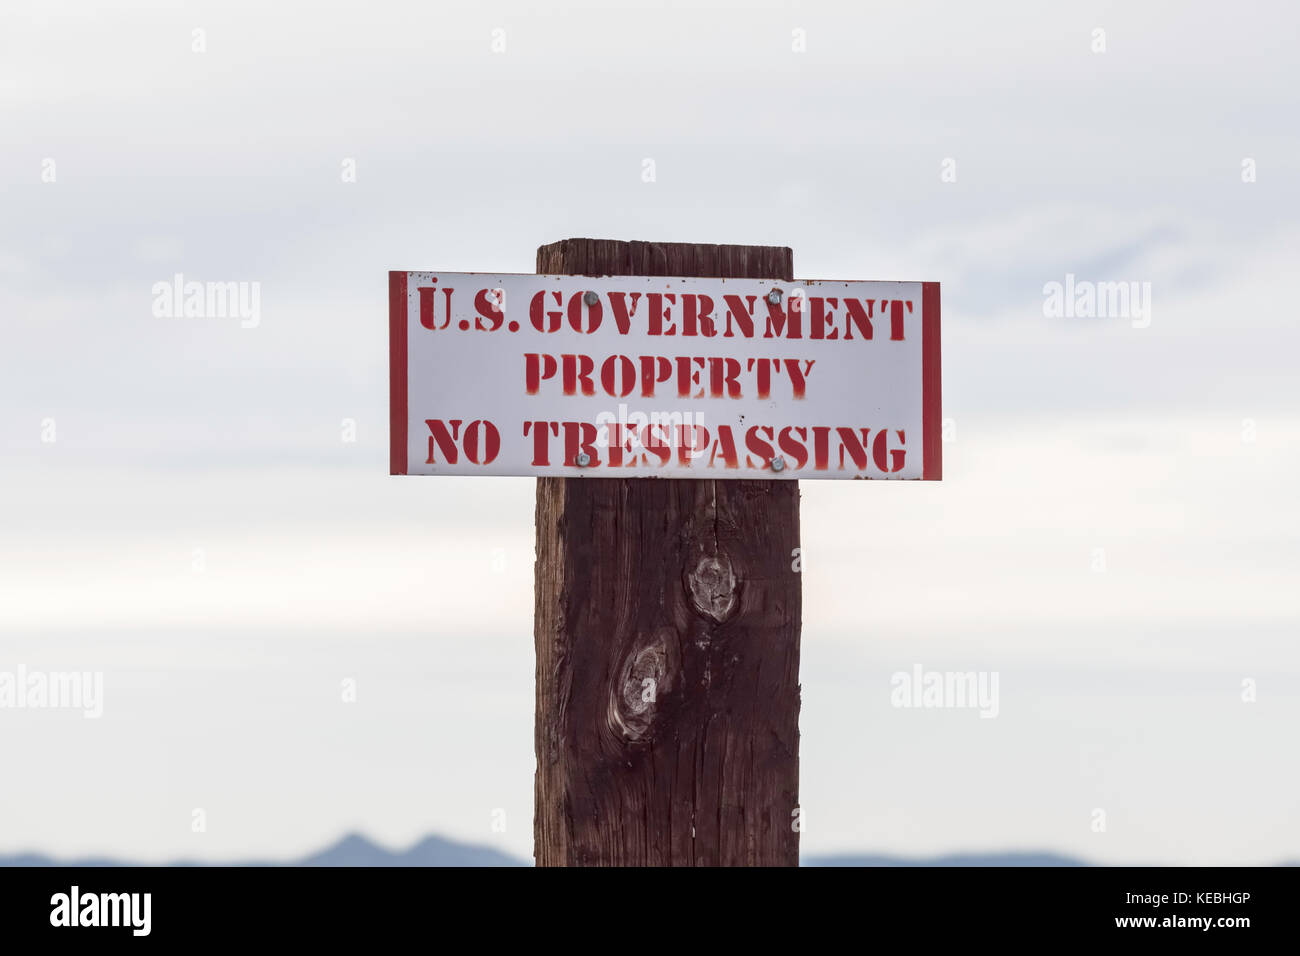 U.S. government no trespassing sign - Stock Image